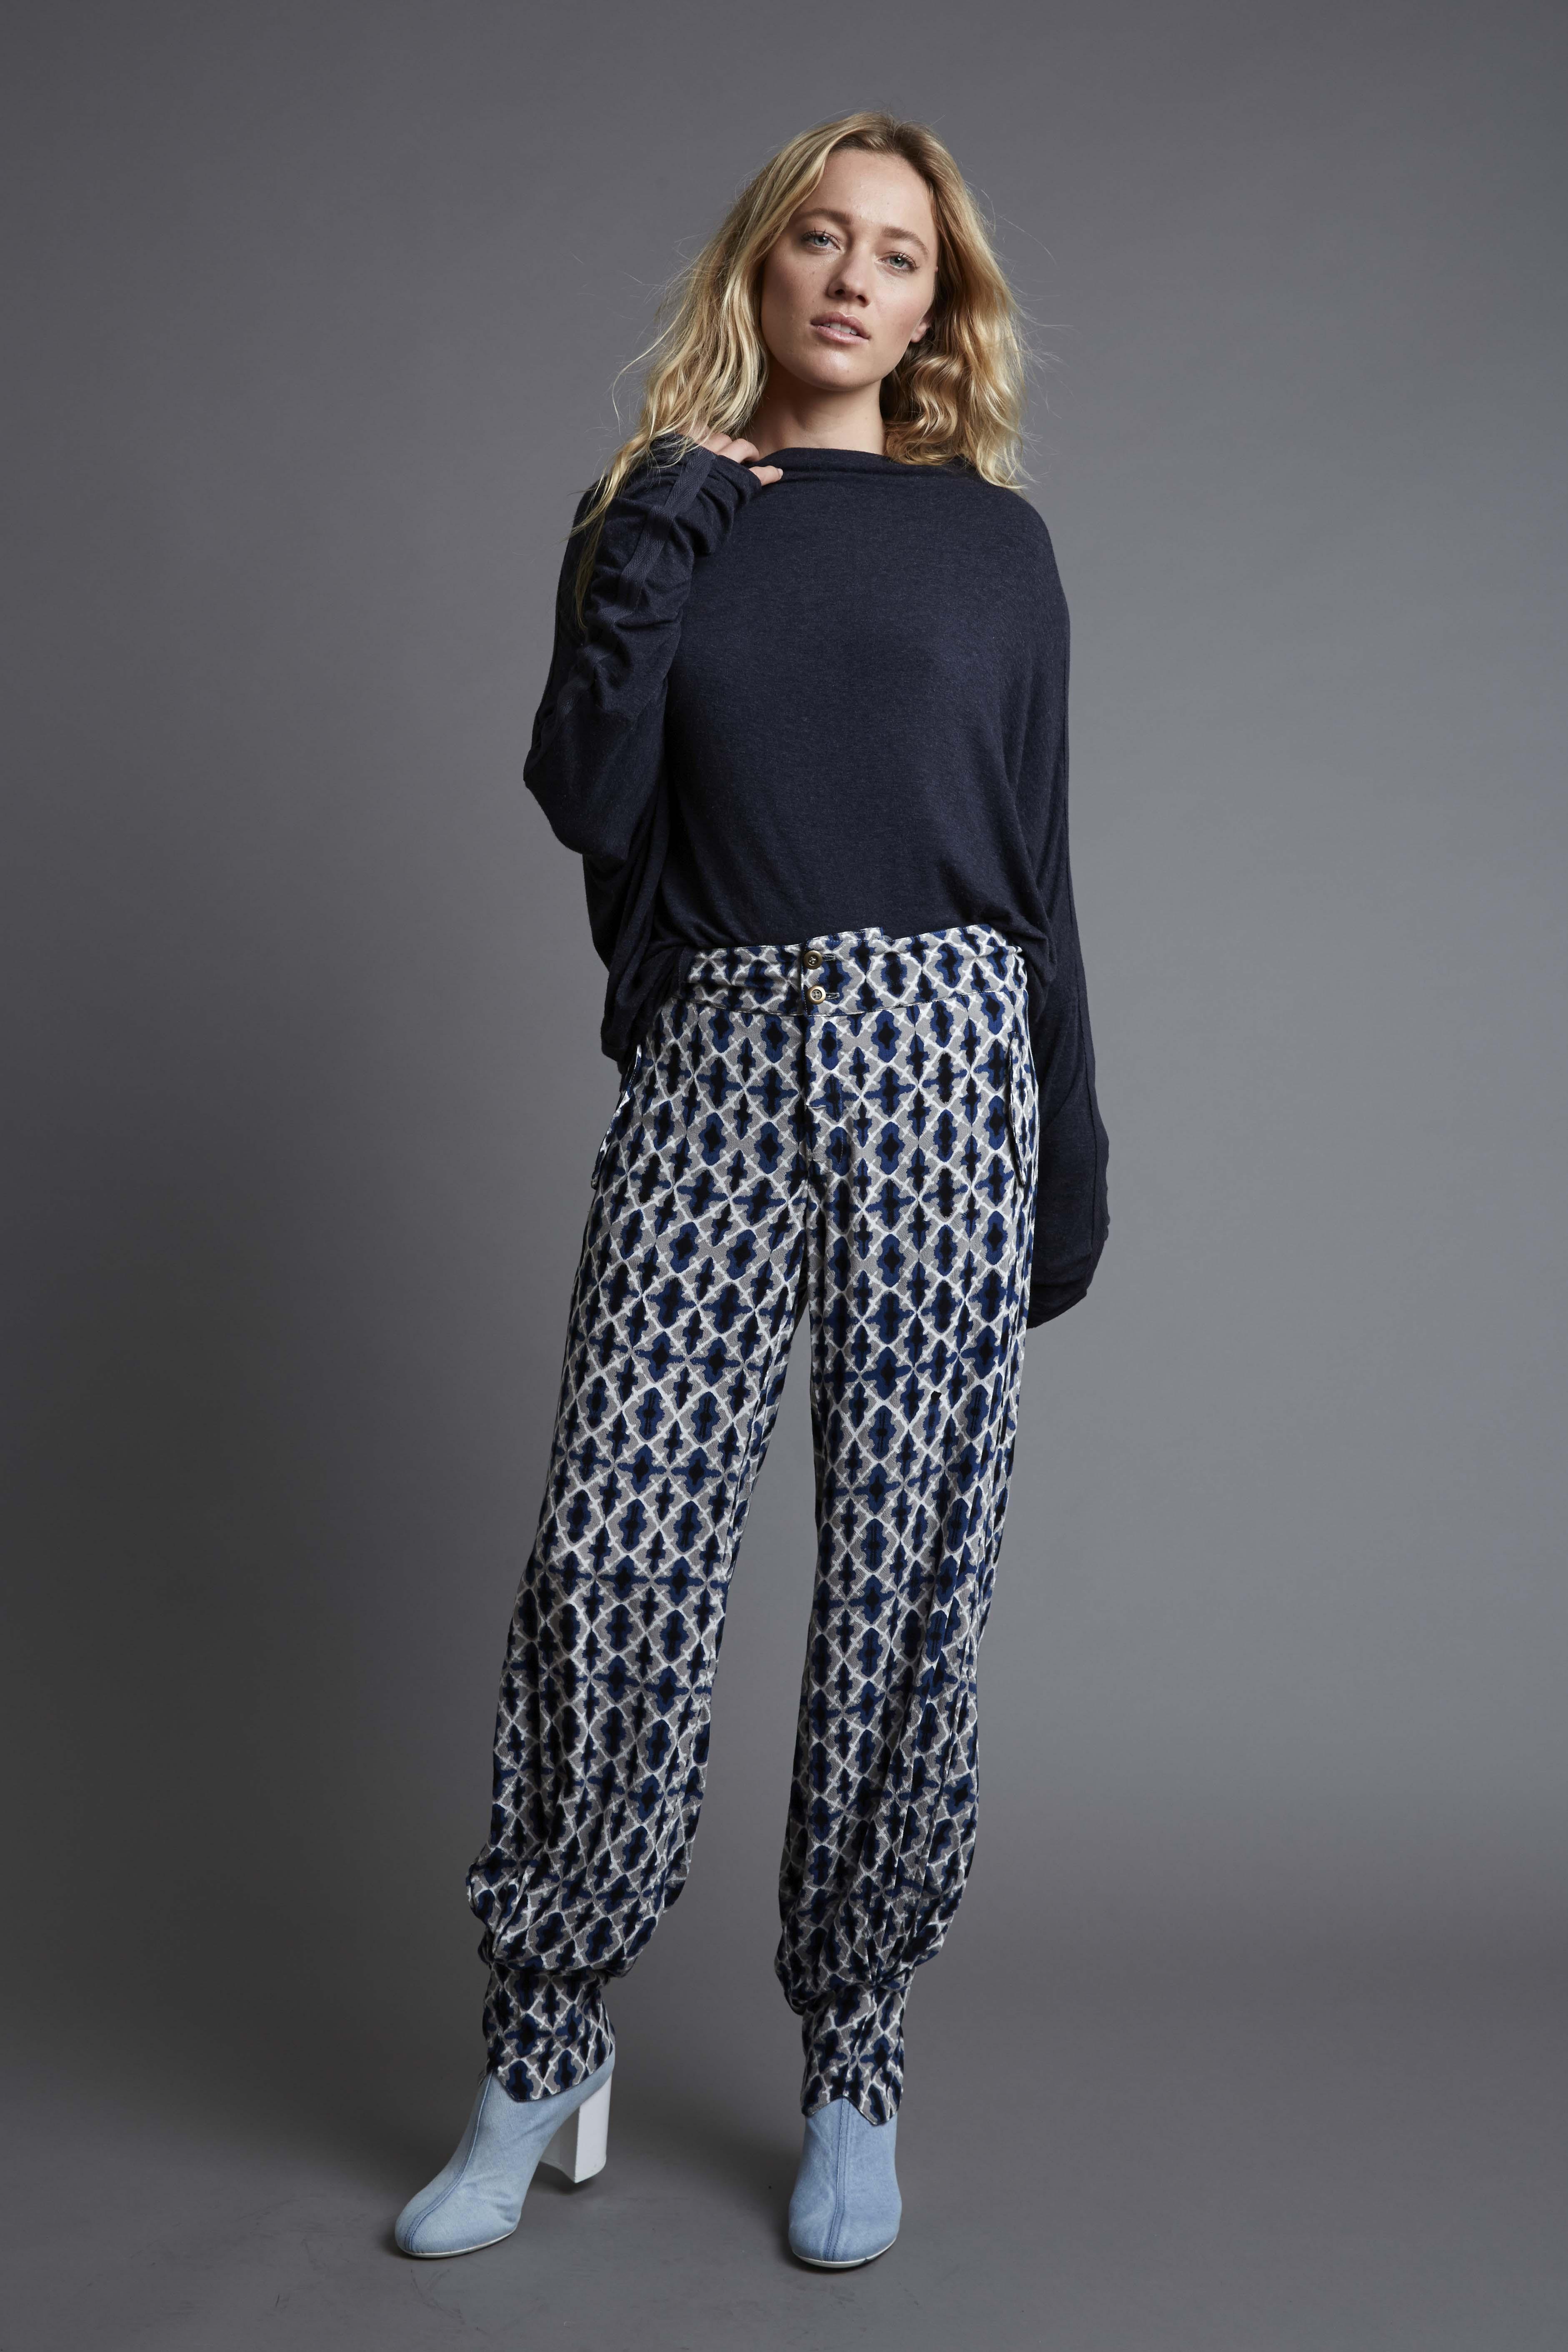 BindingSweater_GraphiteBlue-AnglepoisePant_Shibu Blue_WE-AR_AW17_RHYME-0083